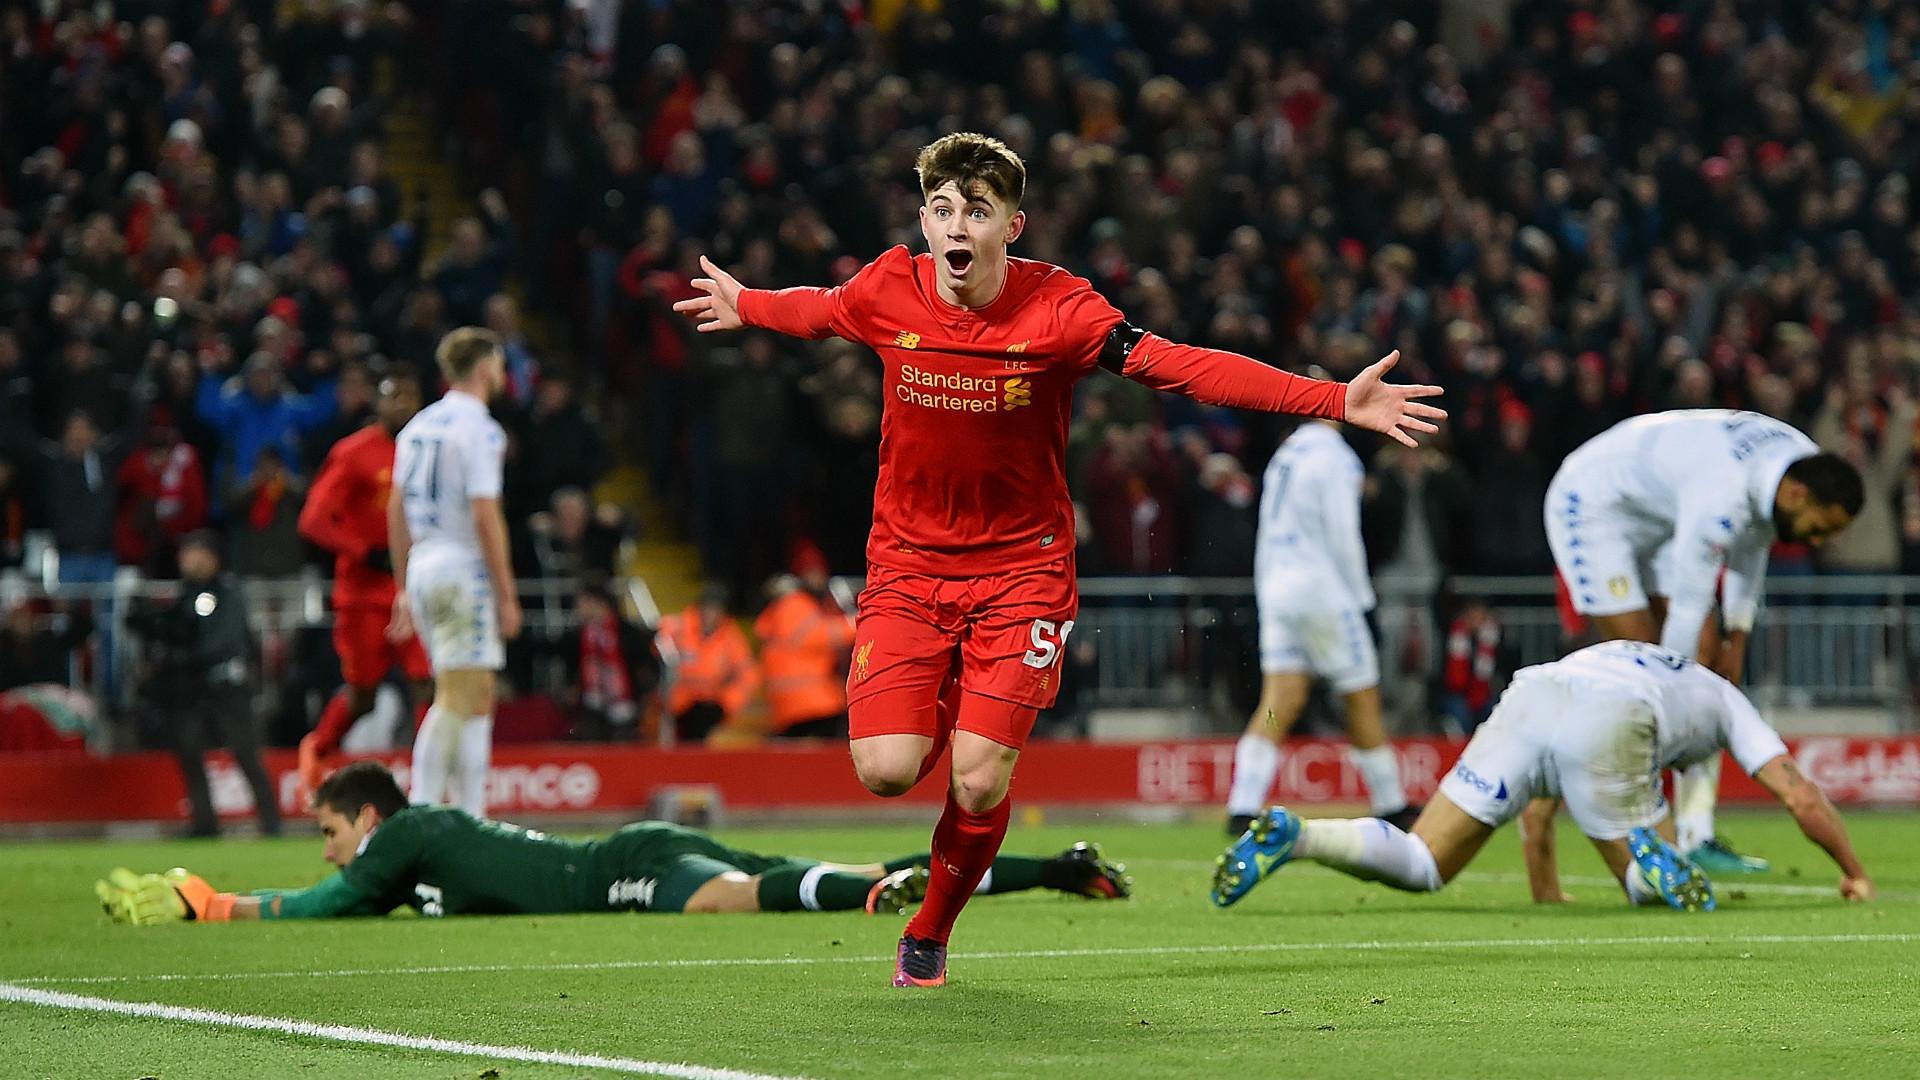 HD Ben Woodburn goal Liverpool v Leeds